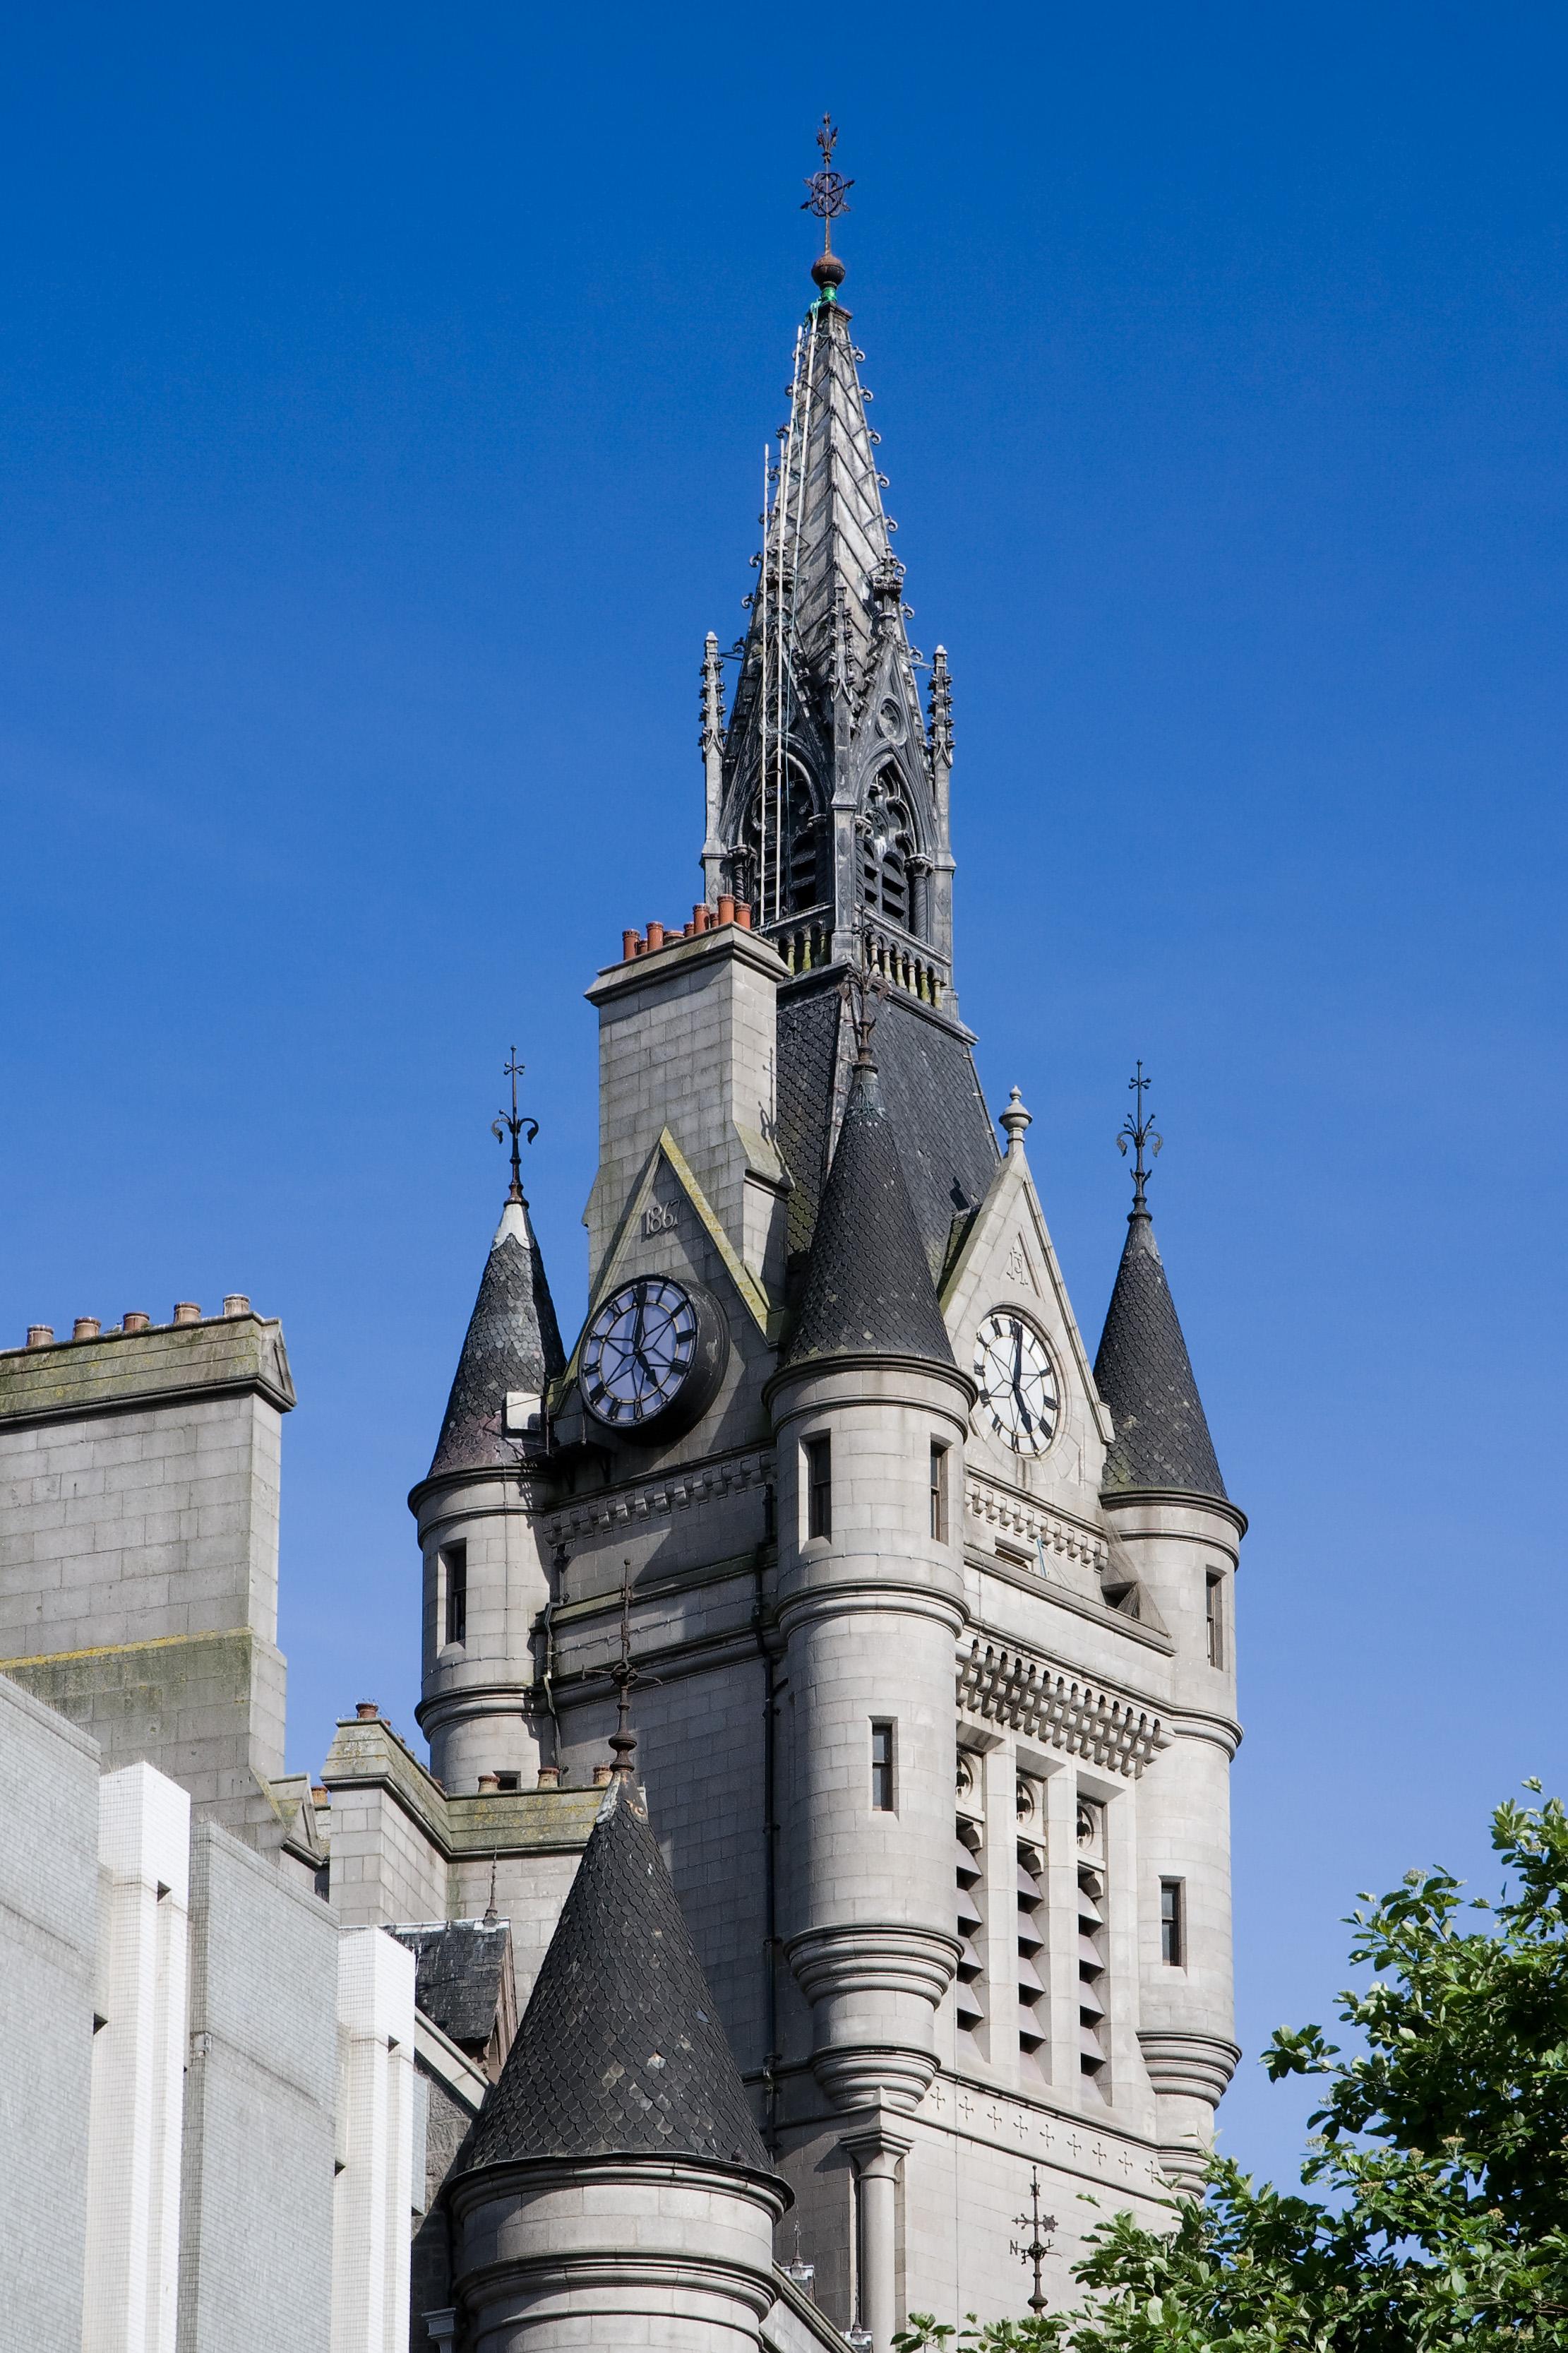 File:Aberdeen town house.jpg - Wikimedia Commonsaberdeen town